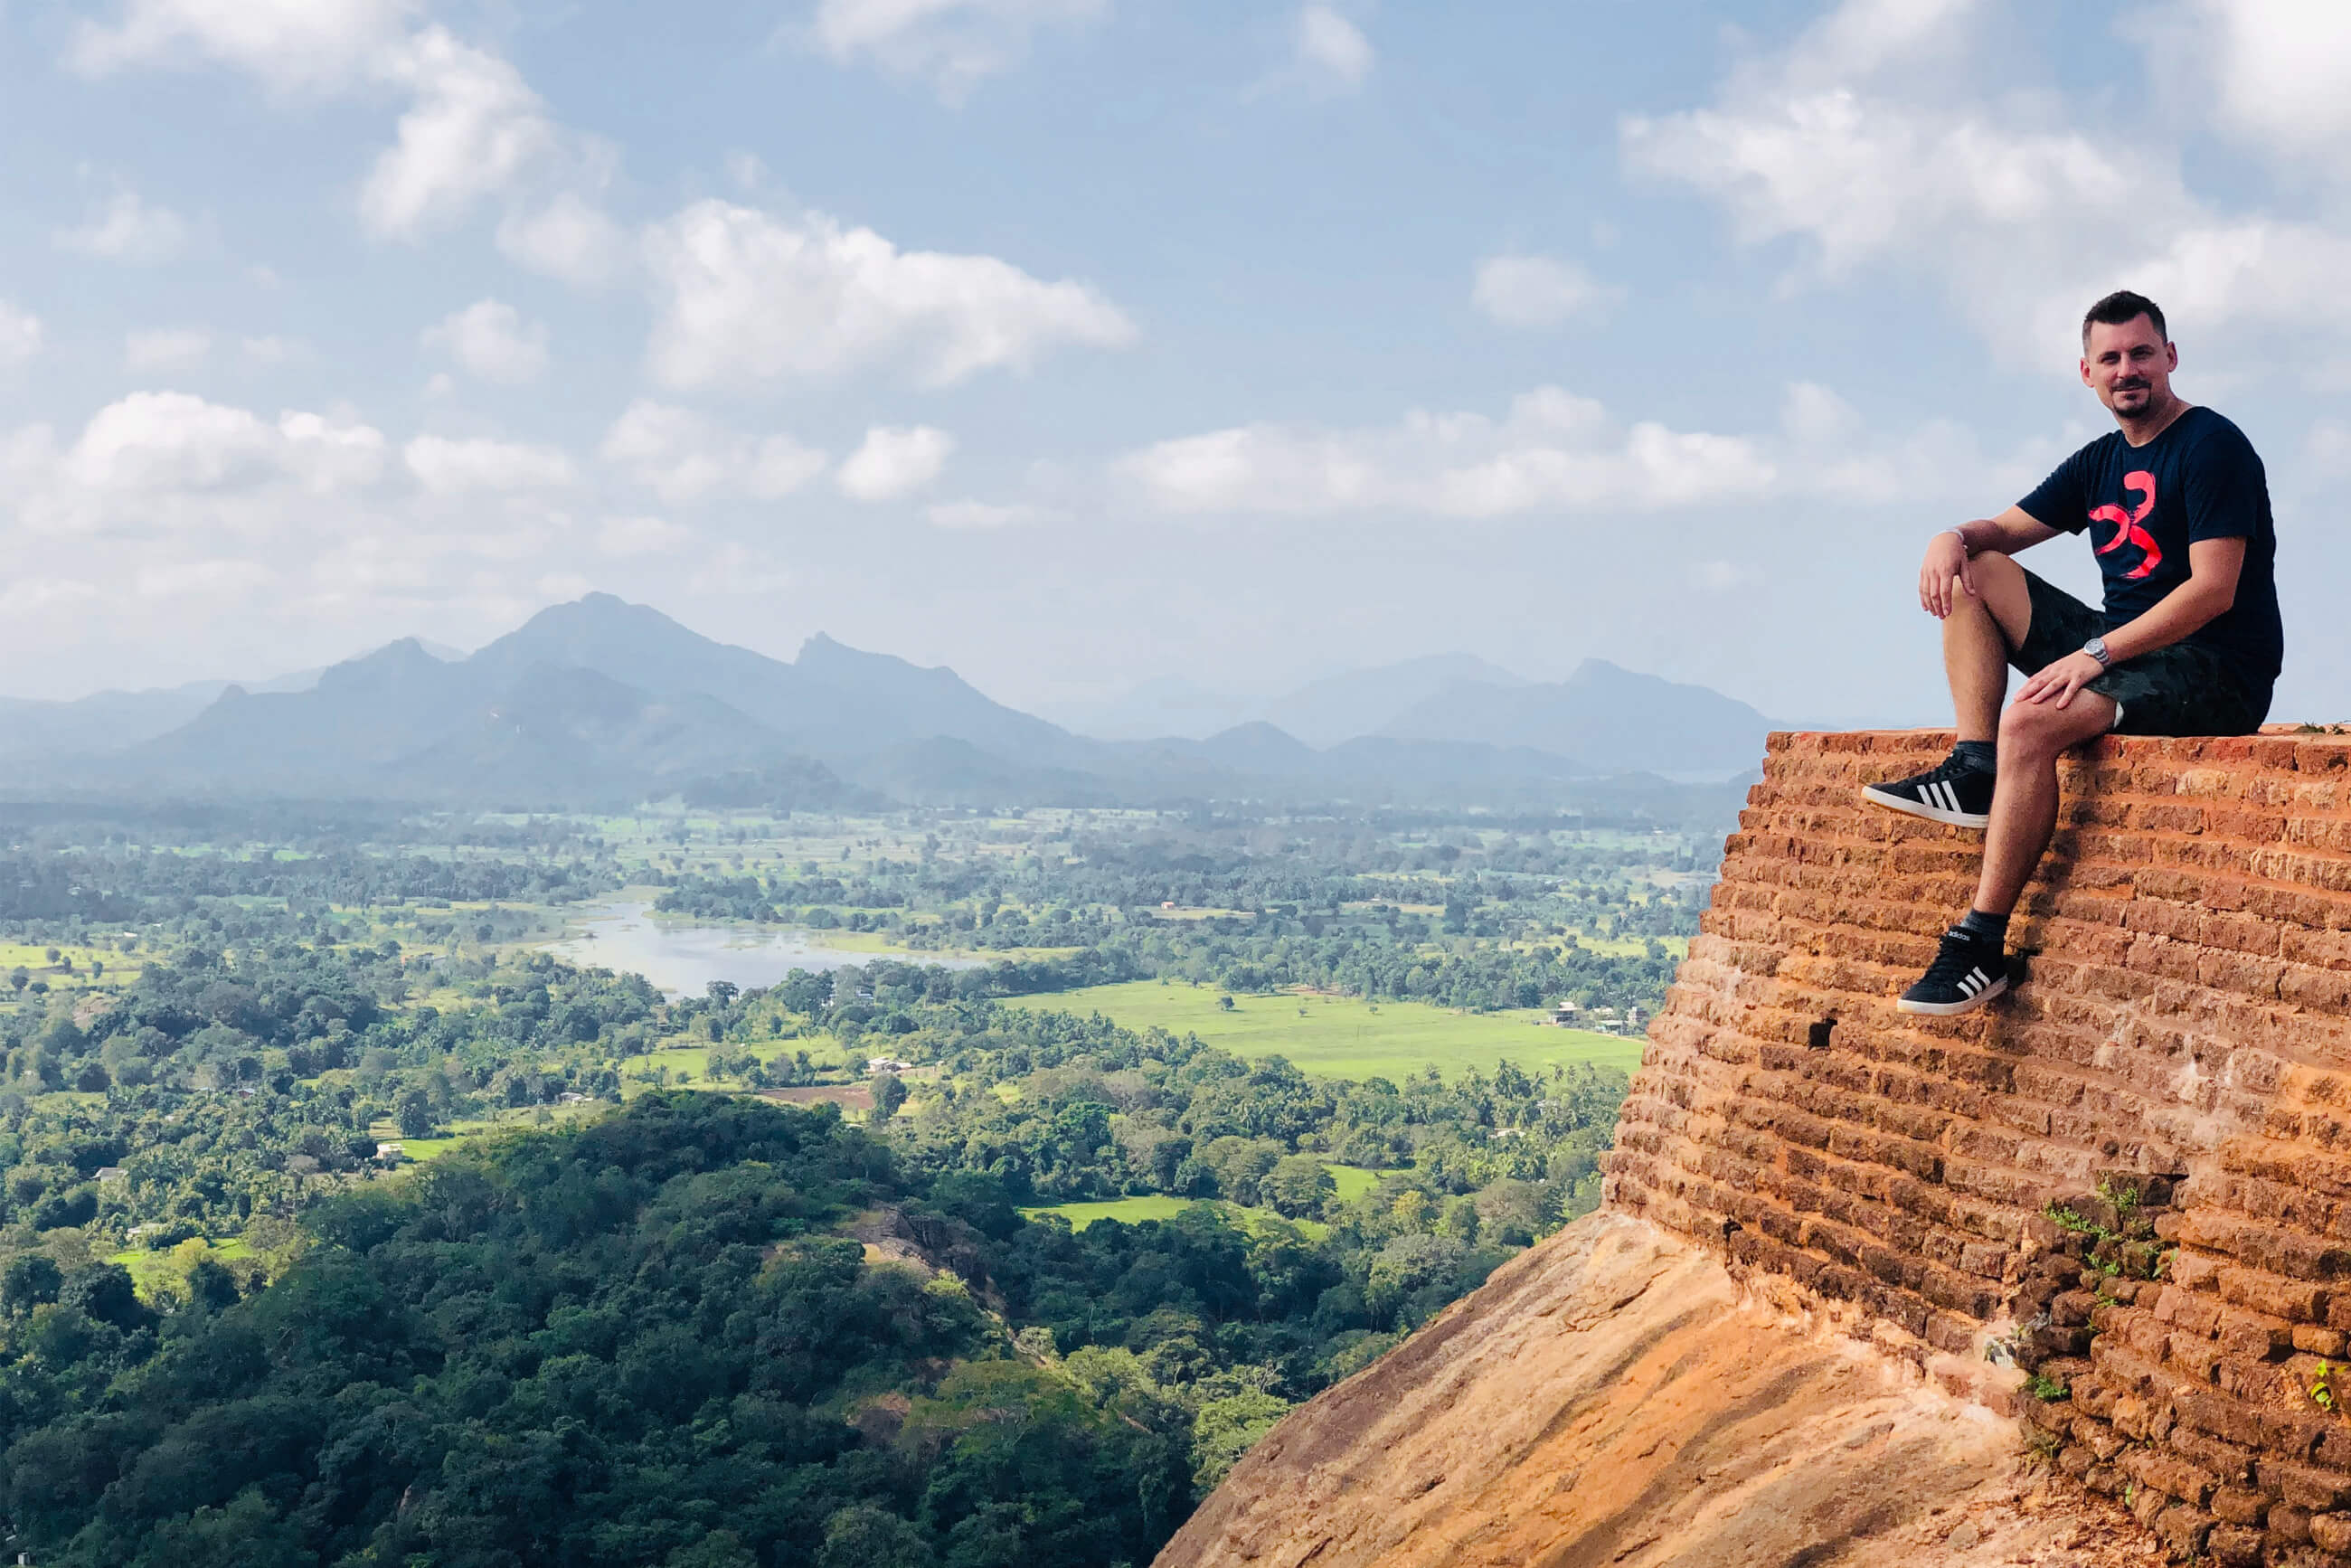 https://bubo.sk/uploads/galleries/7521/martinferencik_srilanka_photo-27-01-2019-13-15-23-1.jpg